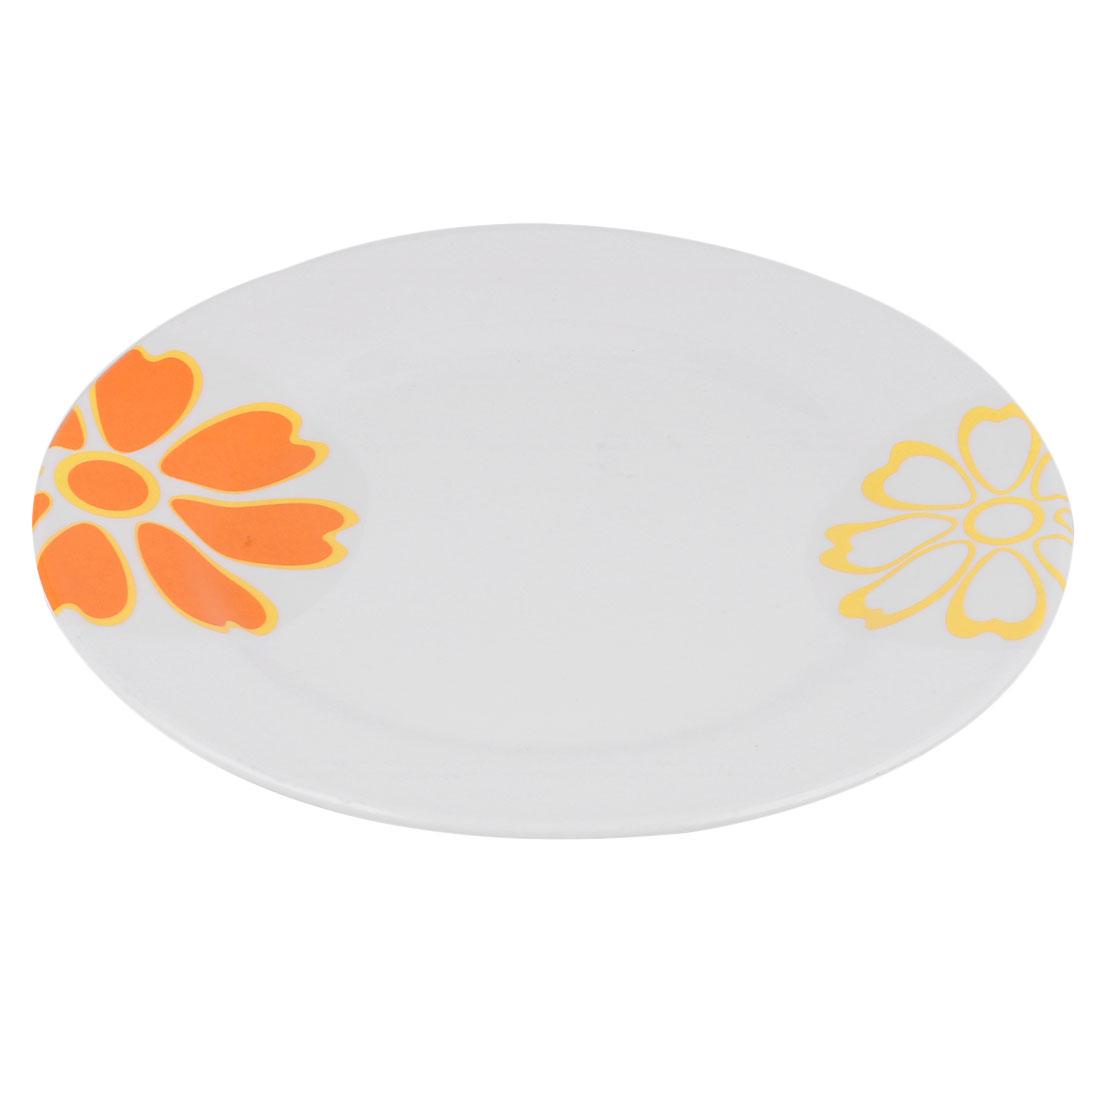 Kitchen Plastic Round Shaped Food Fruit Dessert Storage Plate Tray Dish Orange